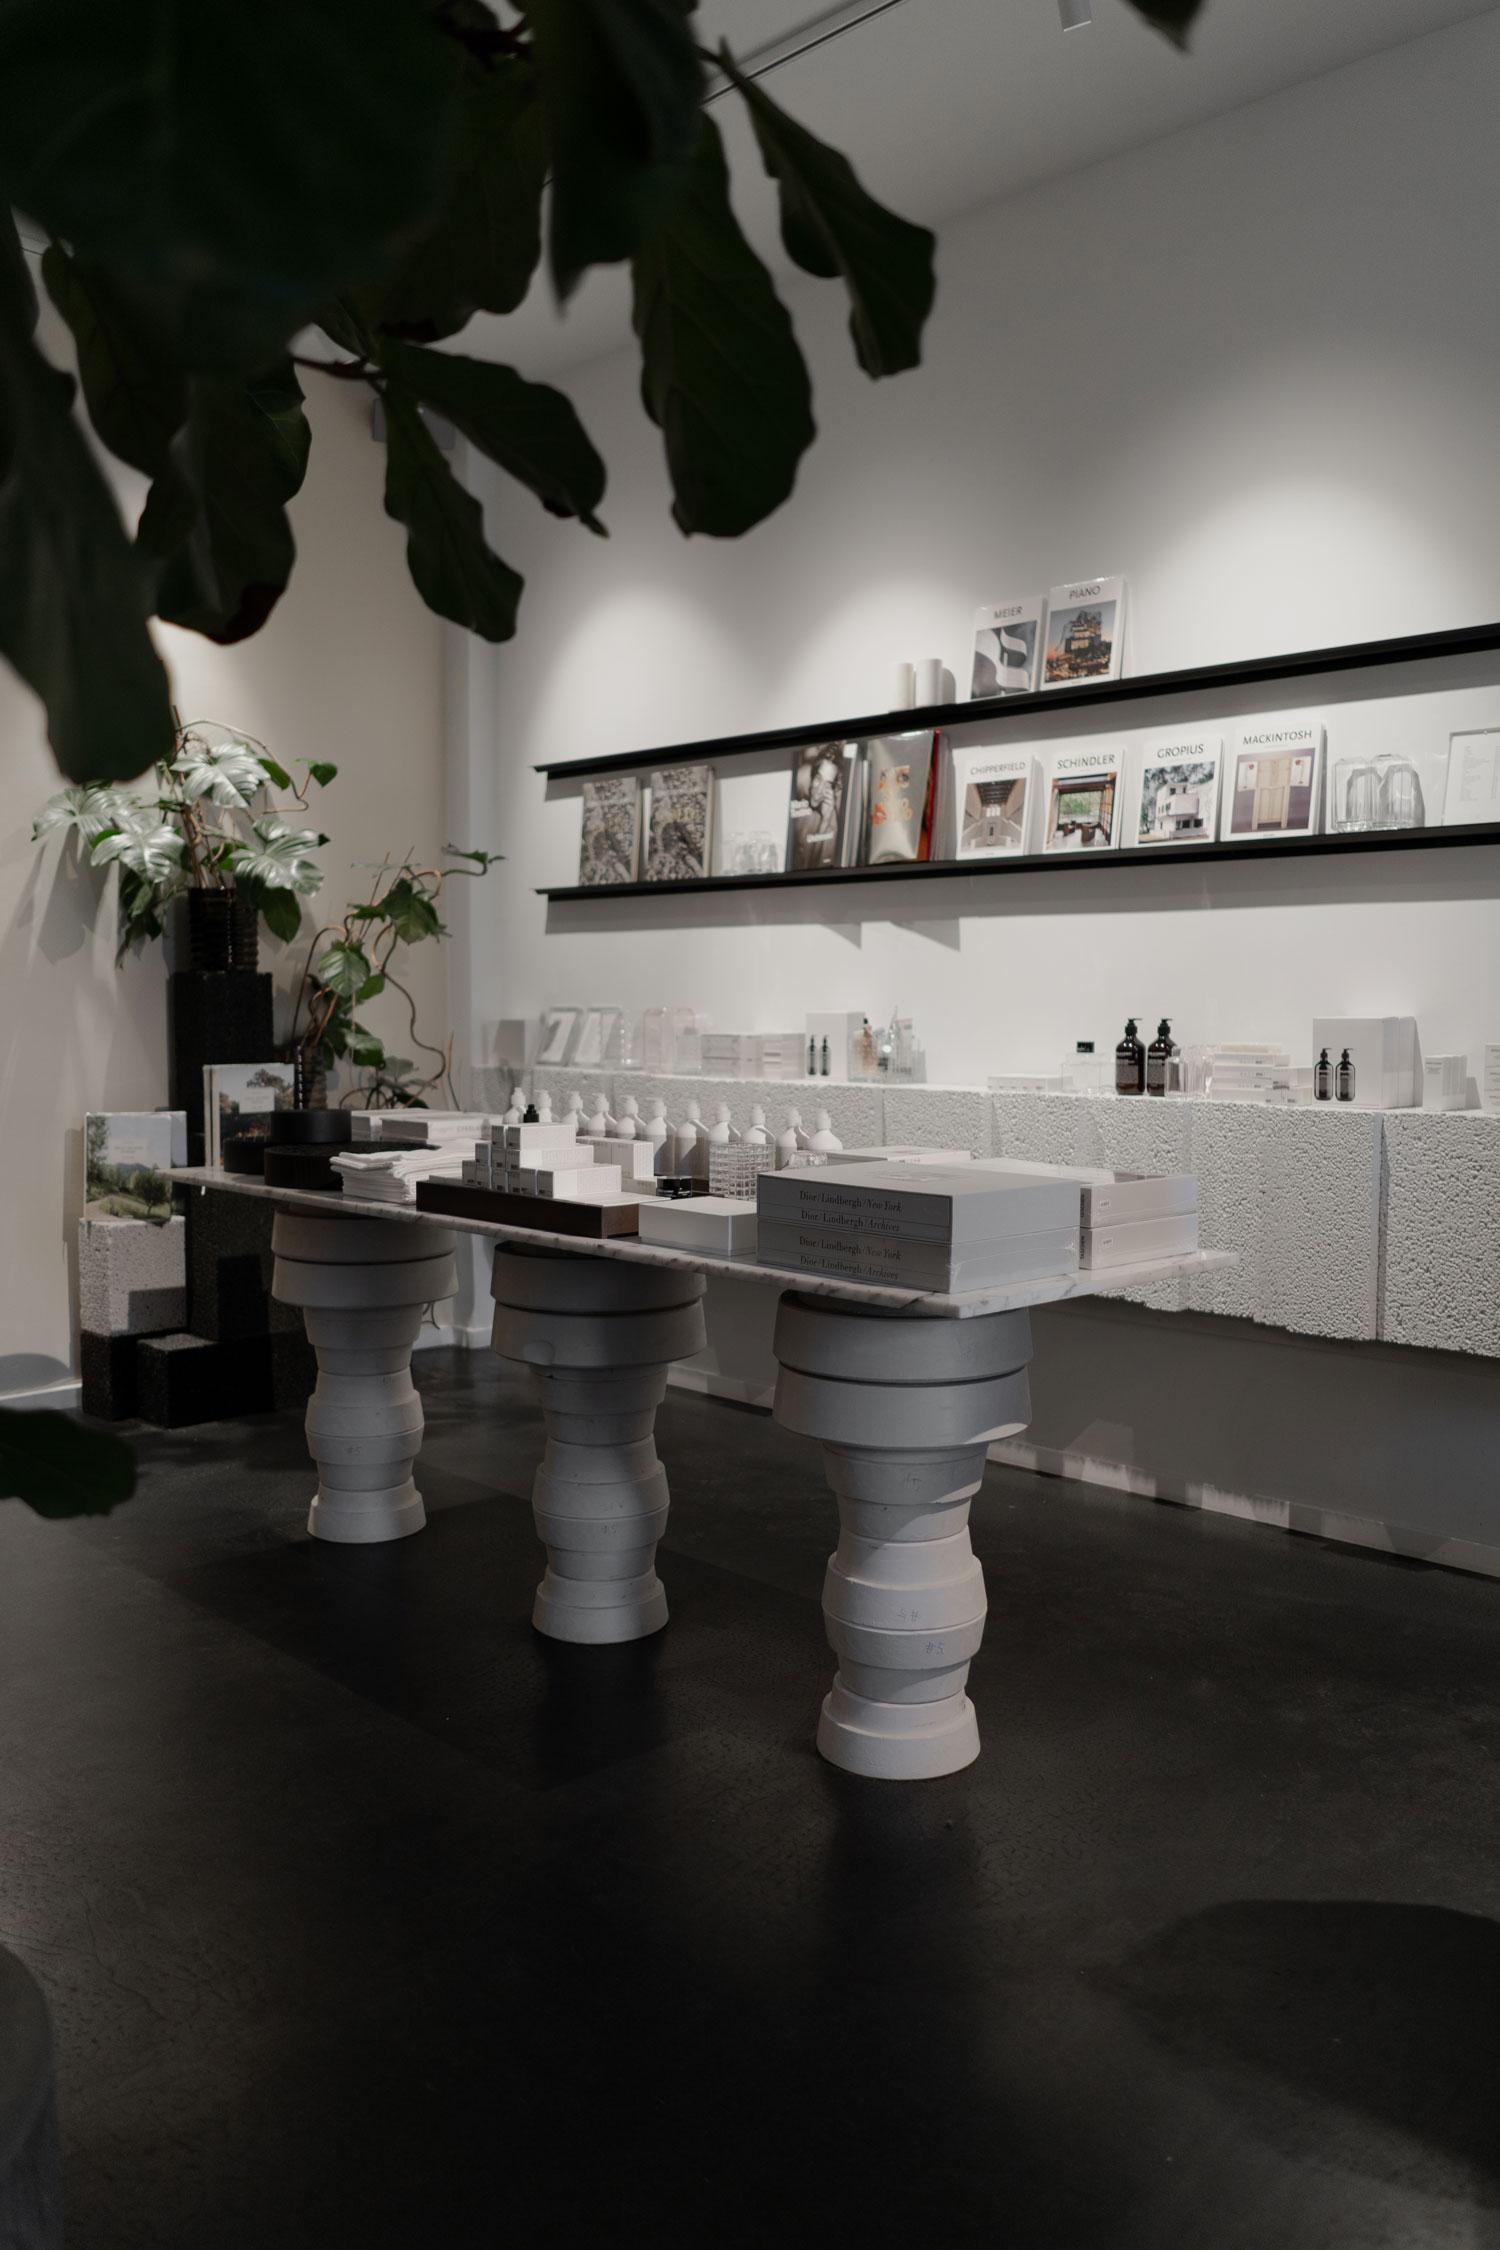 Louise Roe Gallery - www.lesfactoryfemmes.com